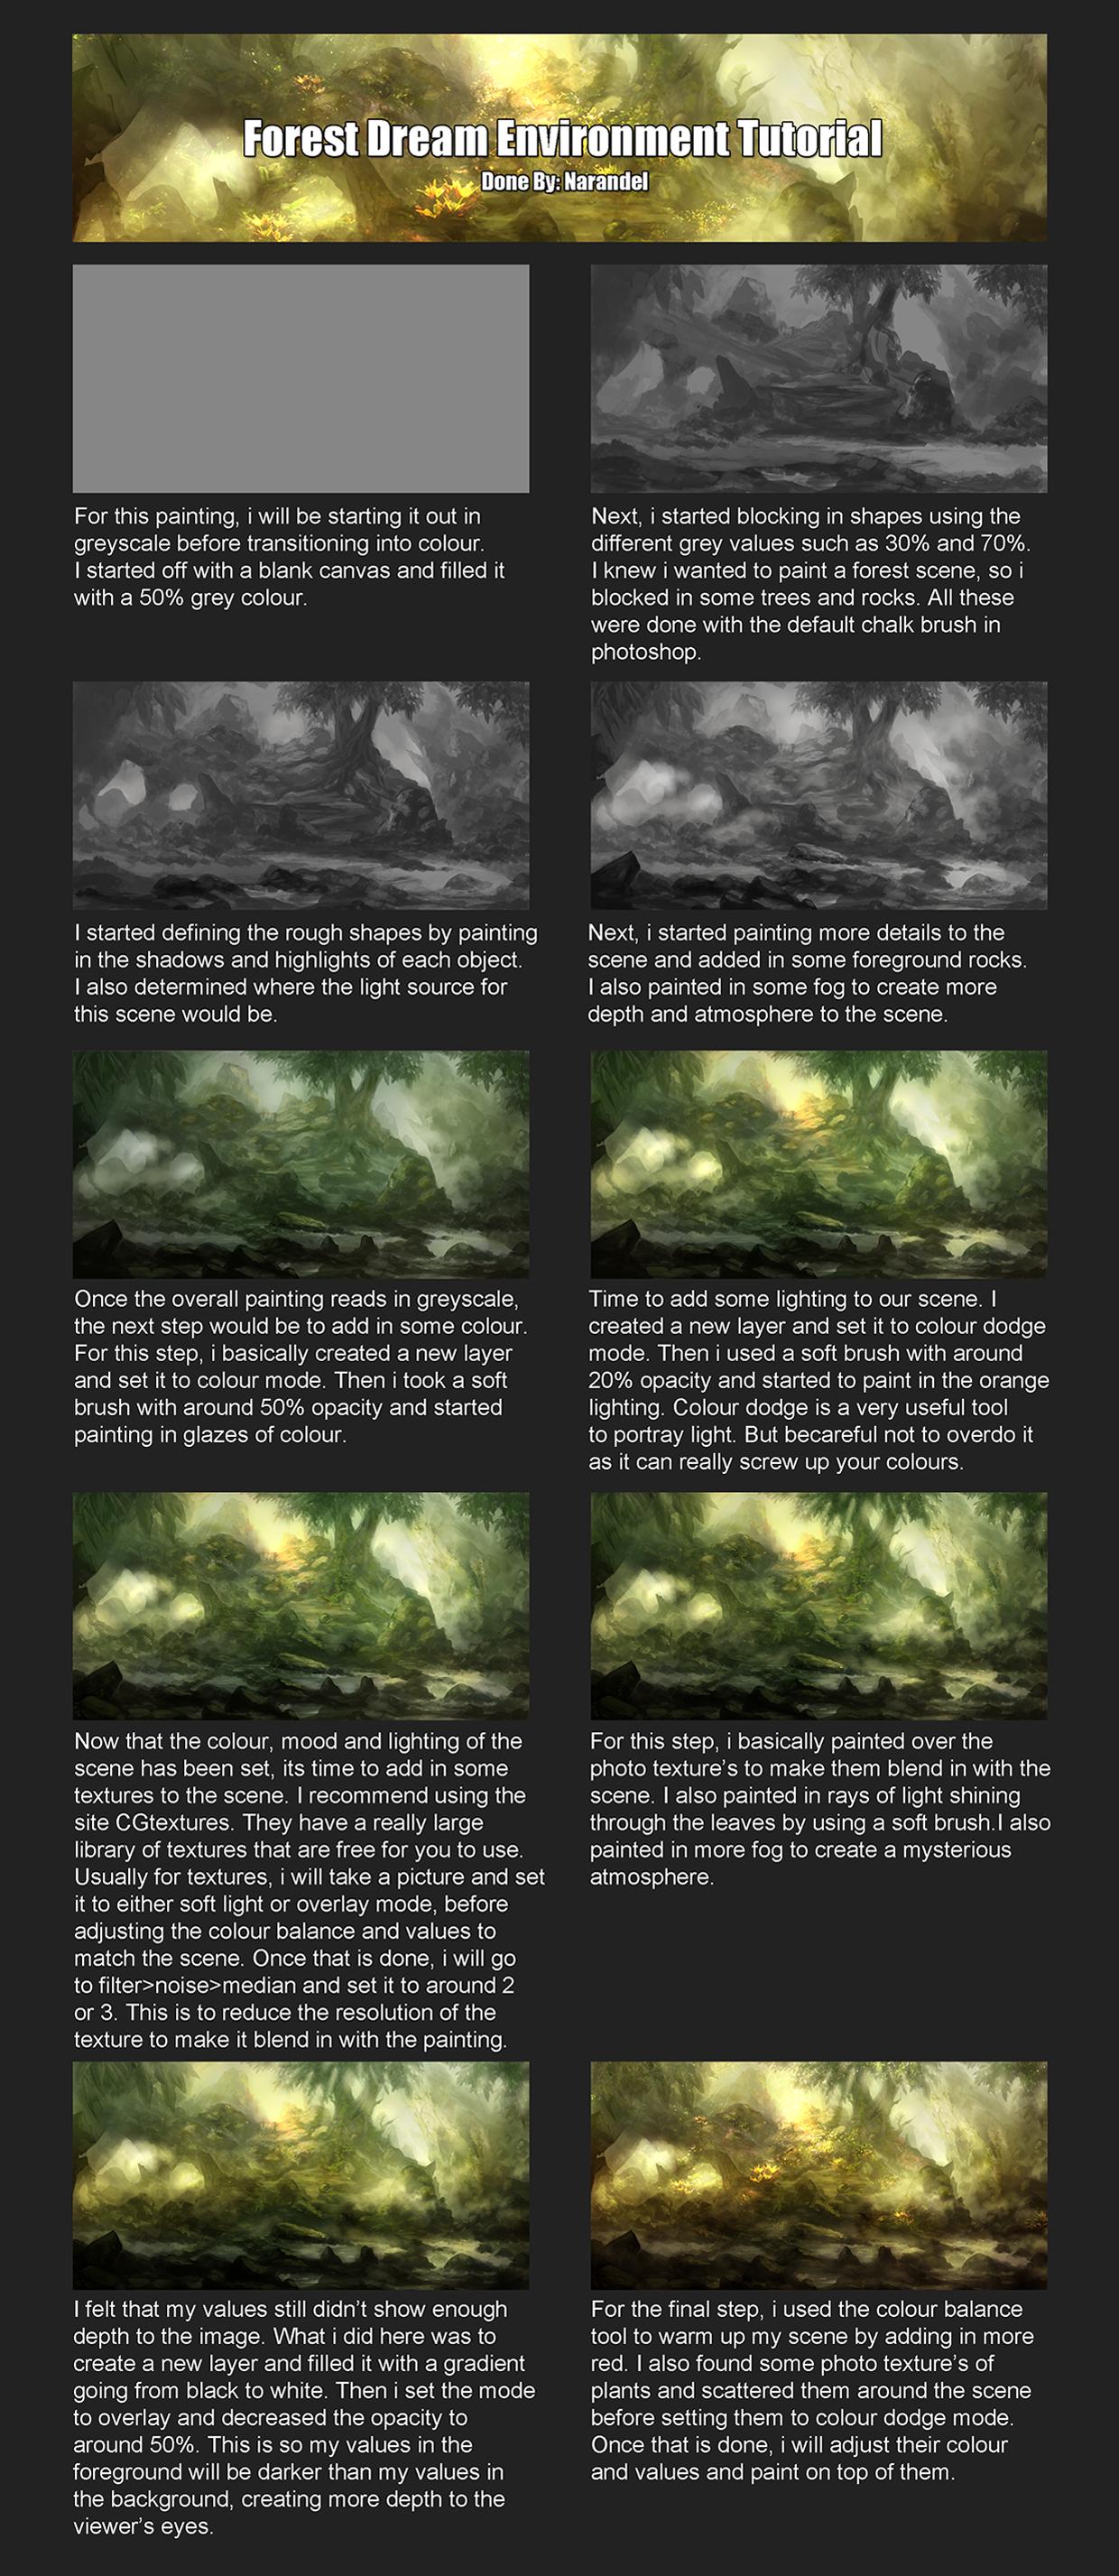 Forest Dream Environment Tutorial by Narandel